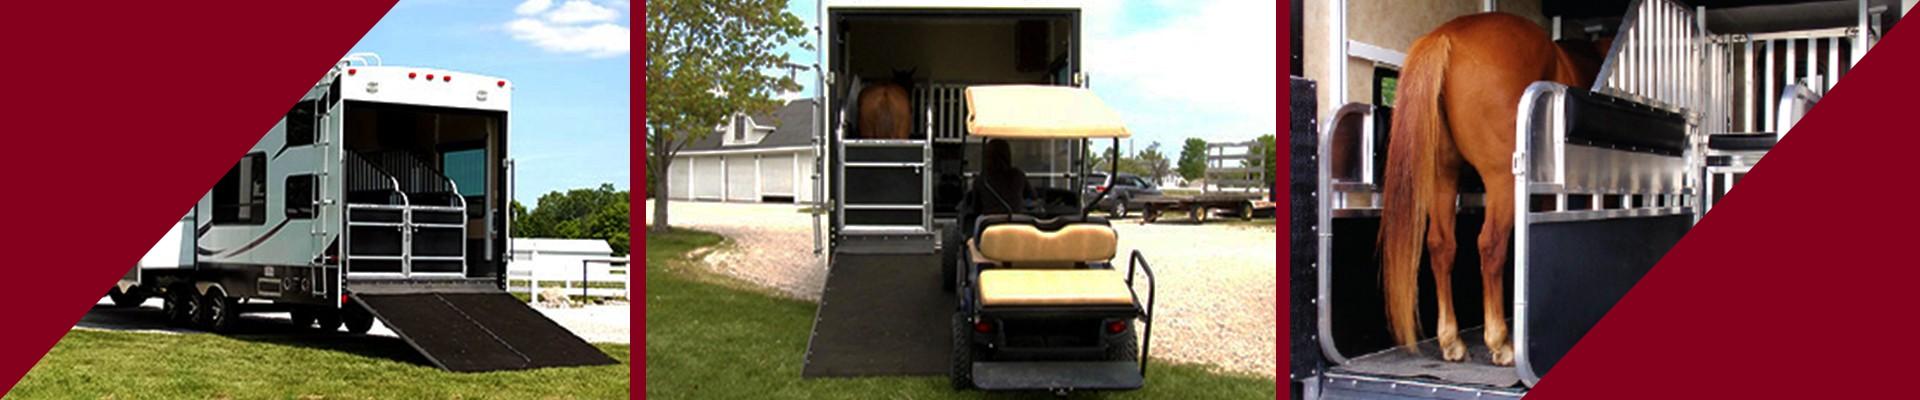 Transform your toy hauler RV into a horse trailer.